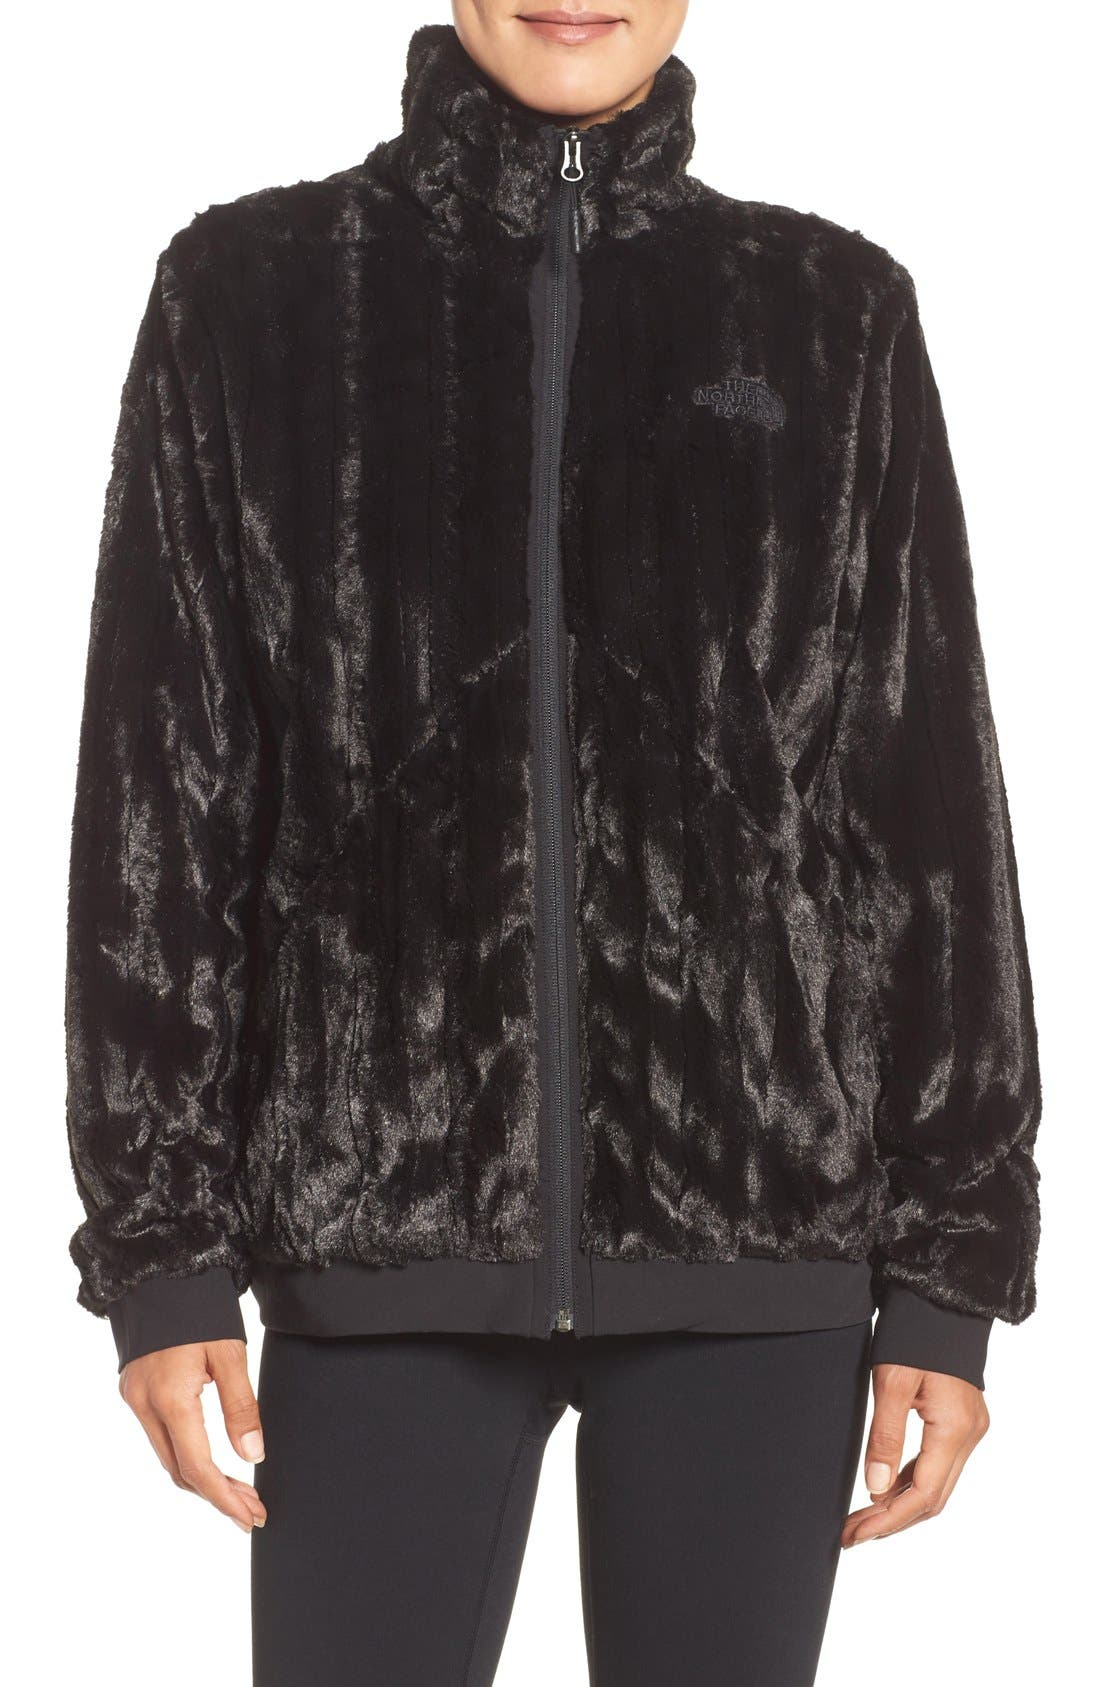 Alternate Image 1 Selected - The North Face Furlander Faux Fur Fleece Jacket